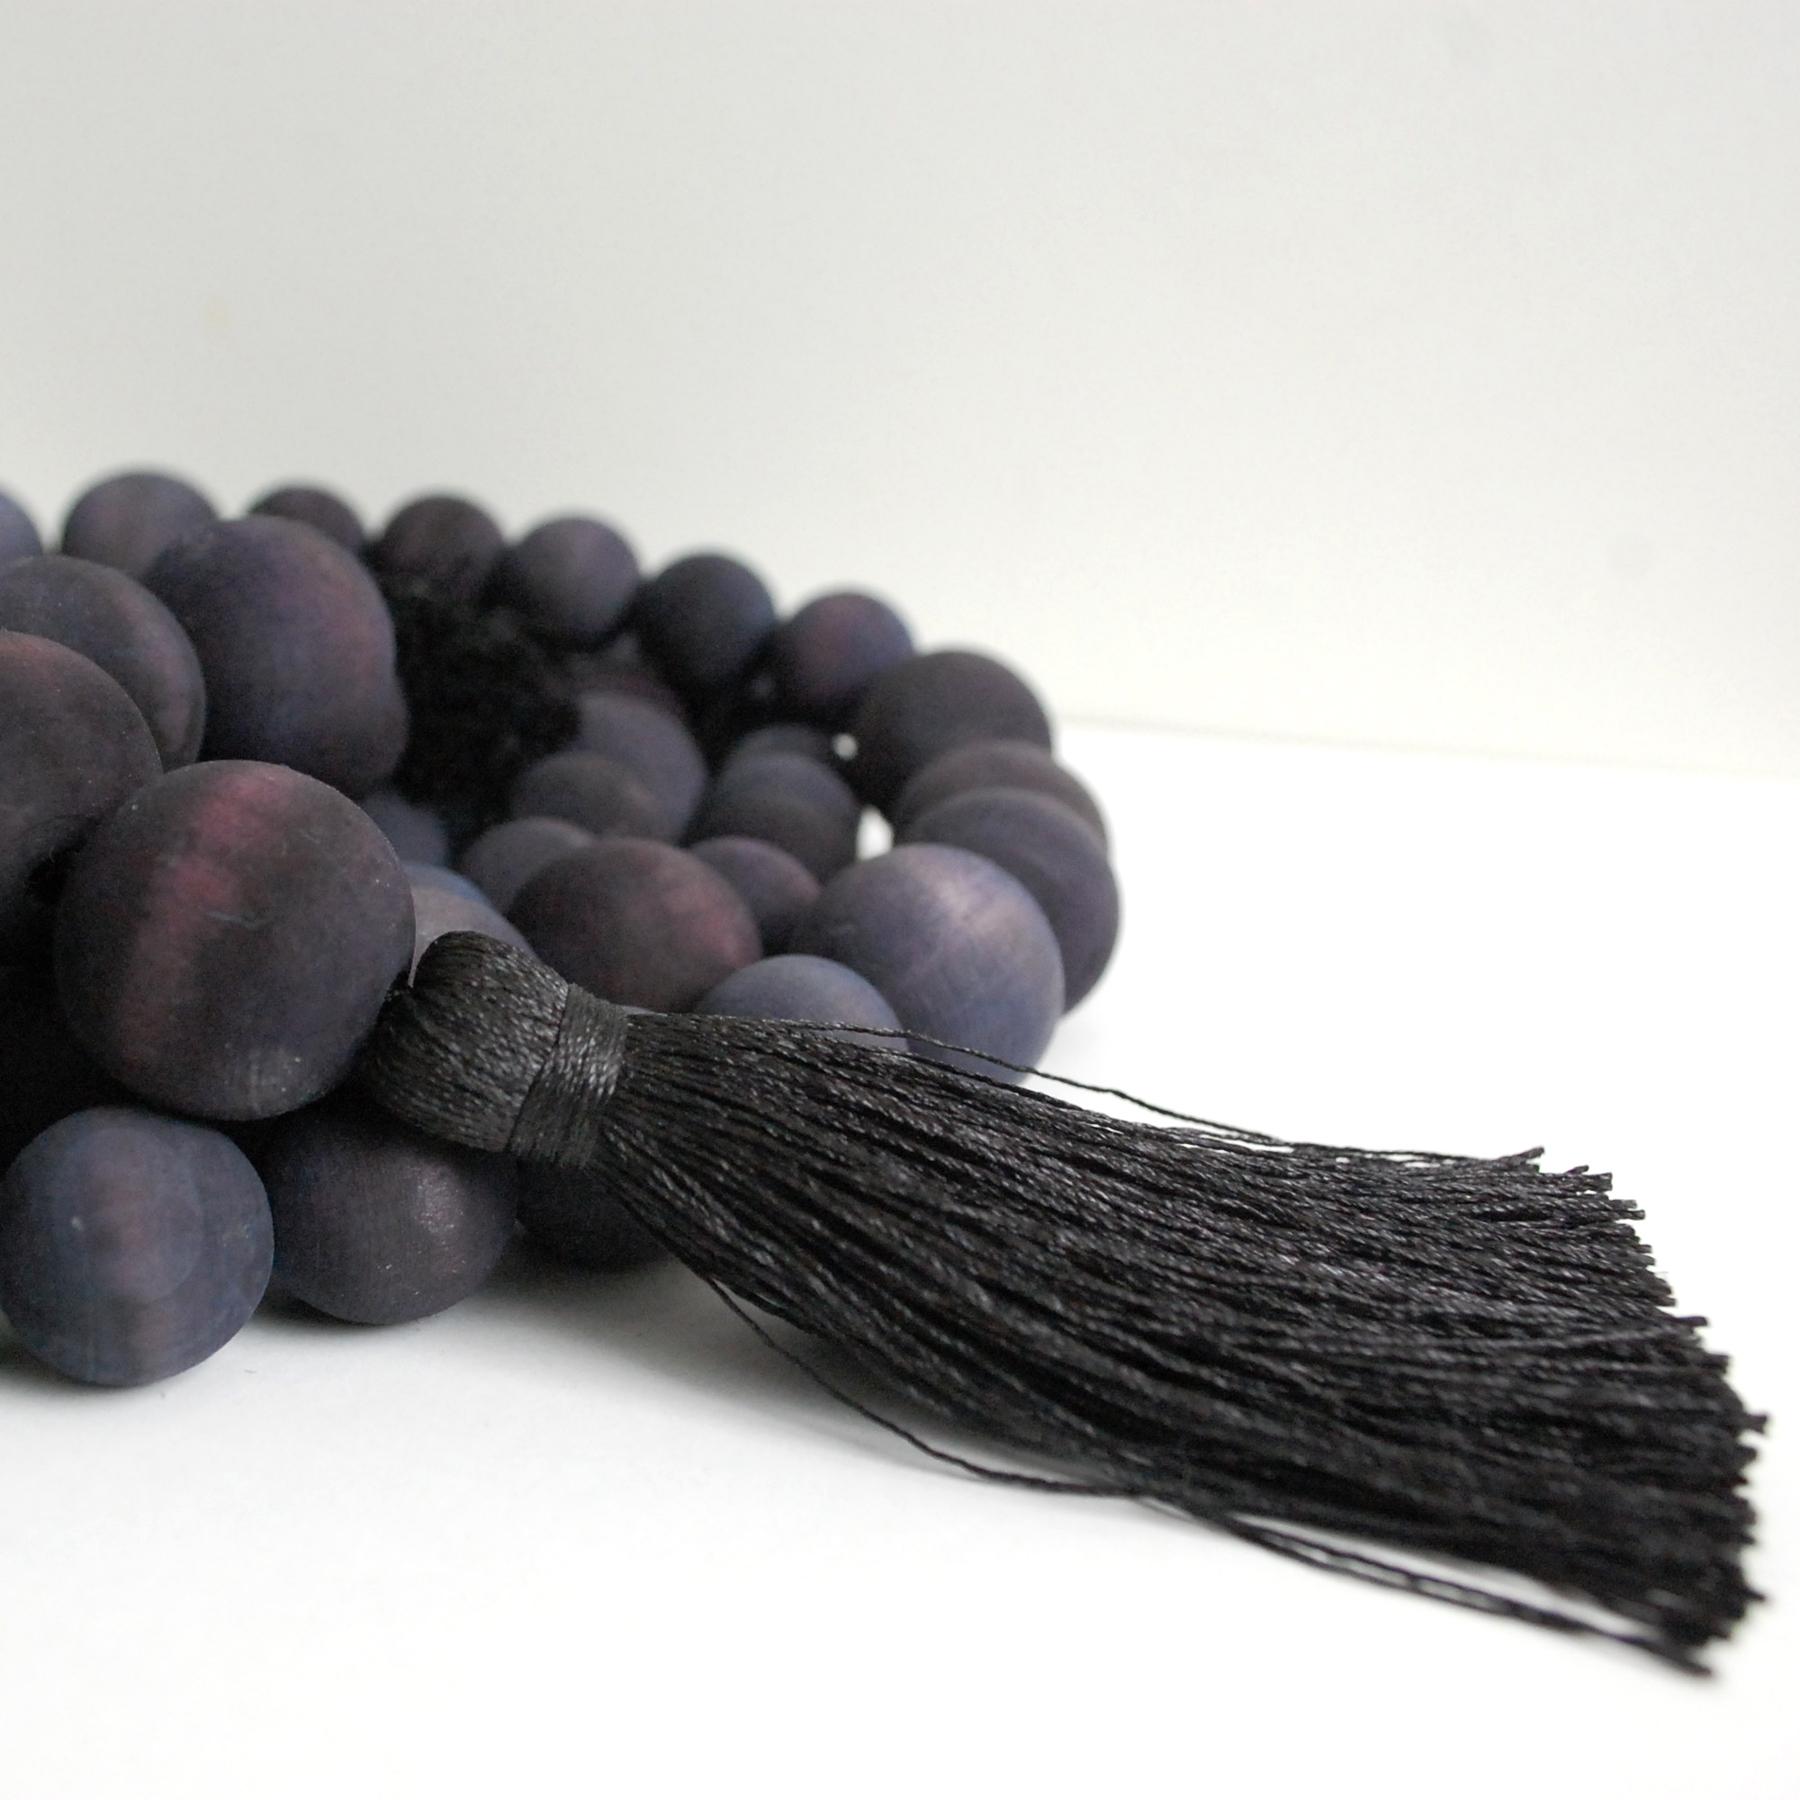 Garland_Black_Wooden-Beads-Tassel-02.jpg